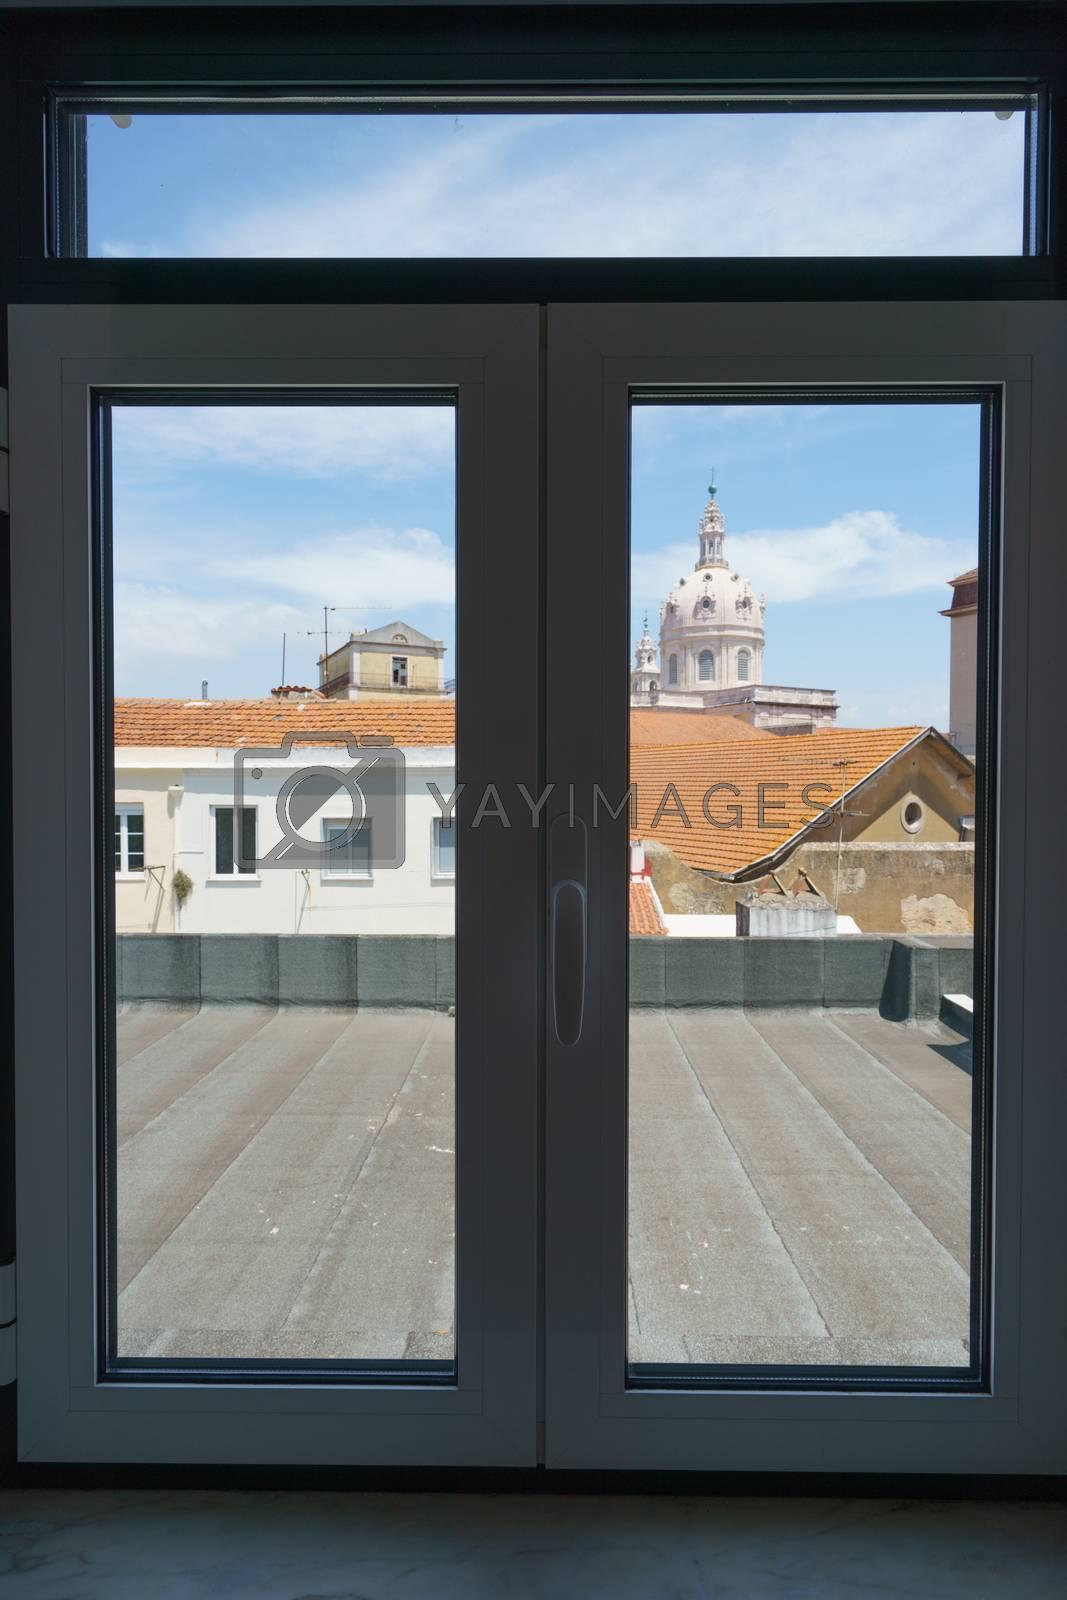 City view through the window